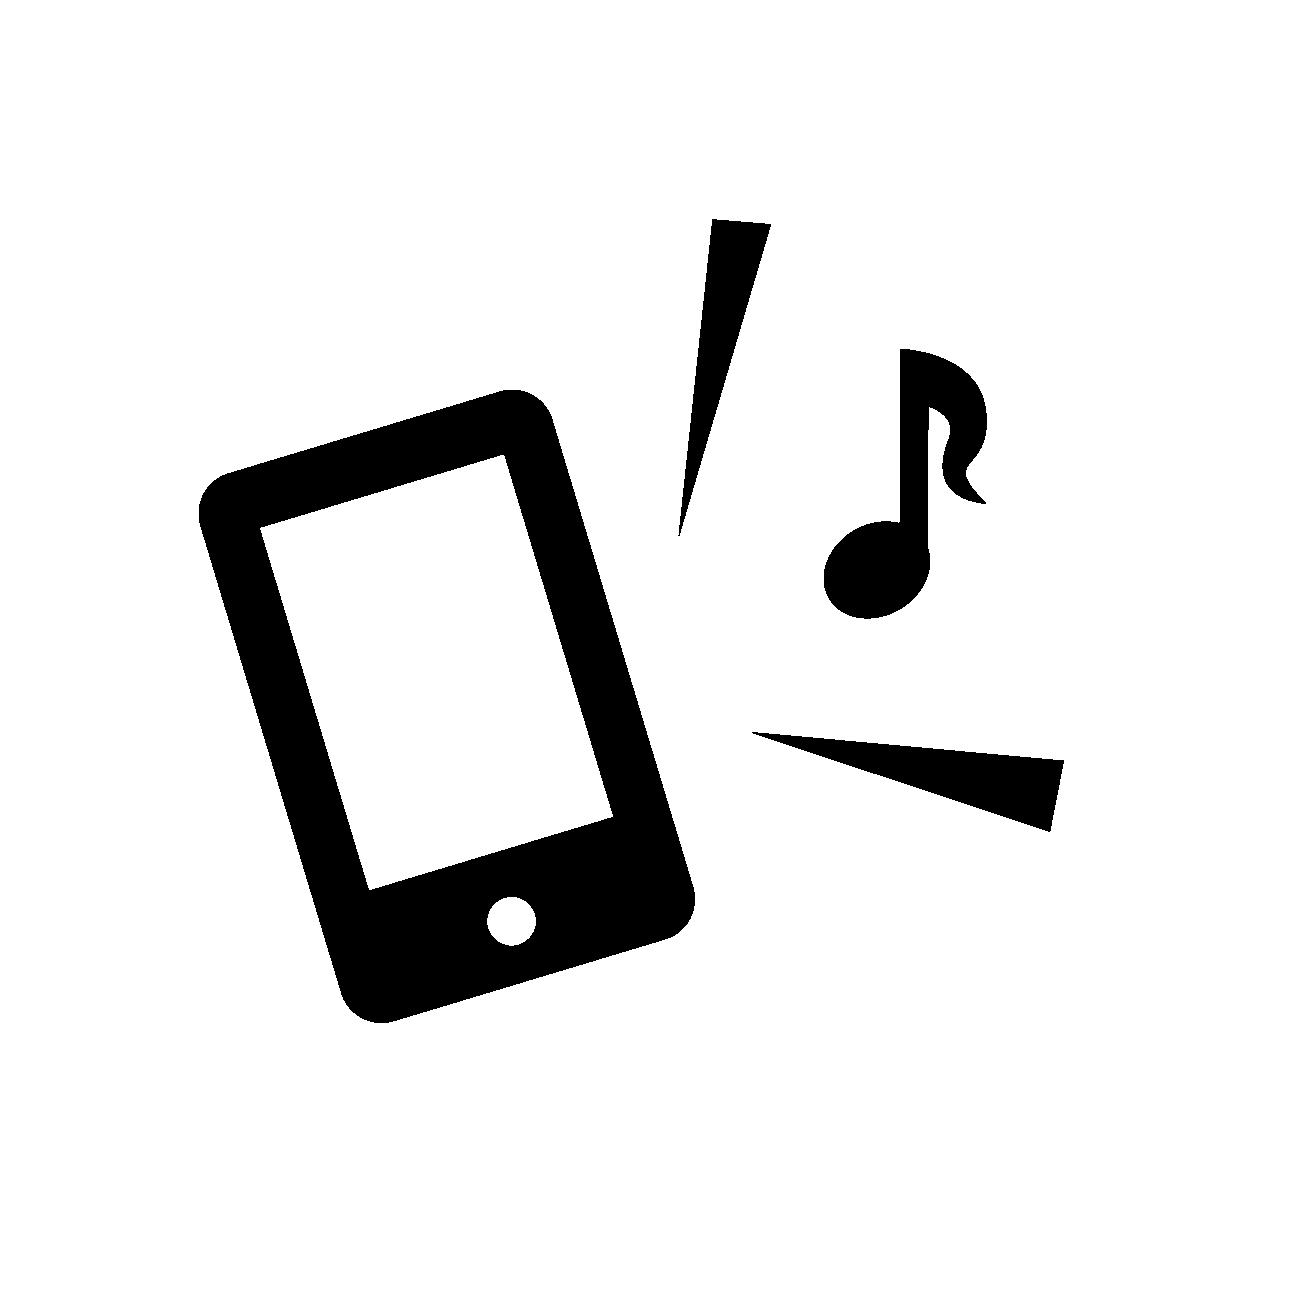 LINEの着信音をiPhone版で変更する方法!オリジナルも可能?